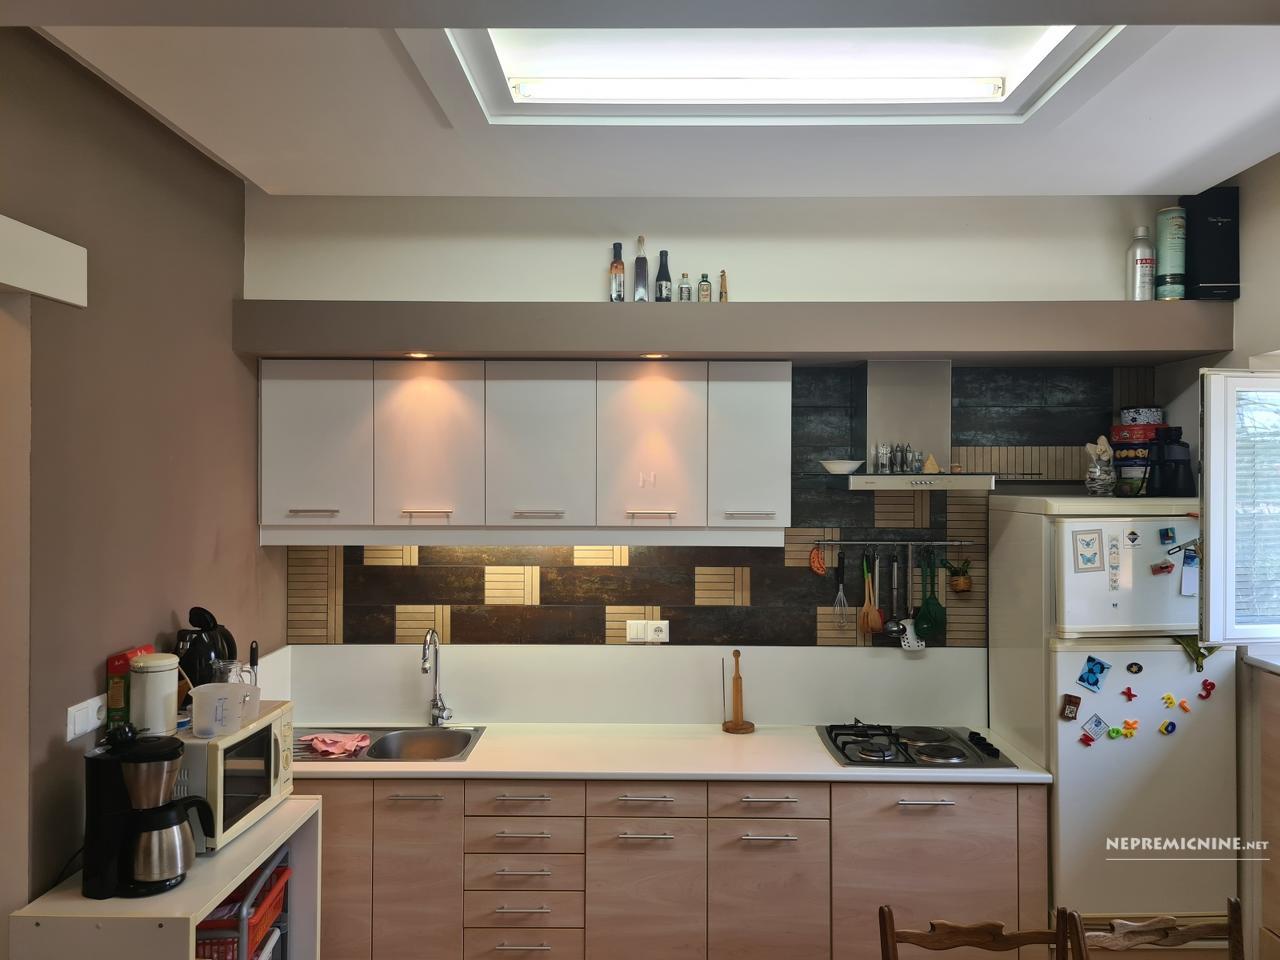 Prodaja, stanovanje - MALINSKA 2